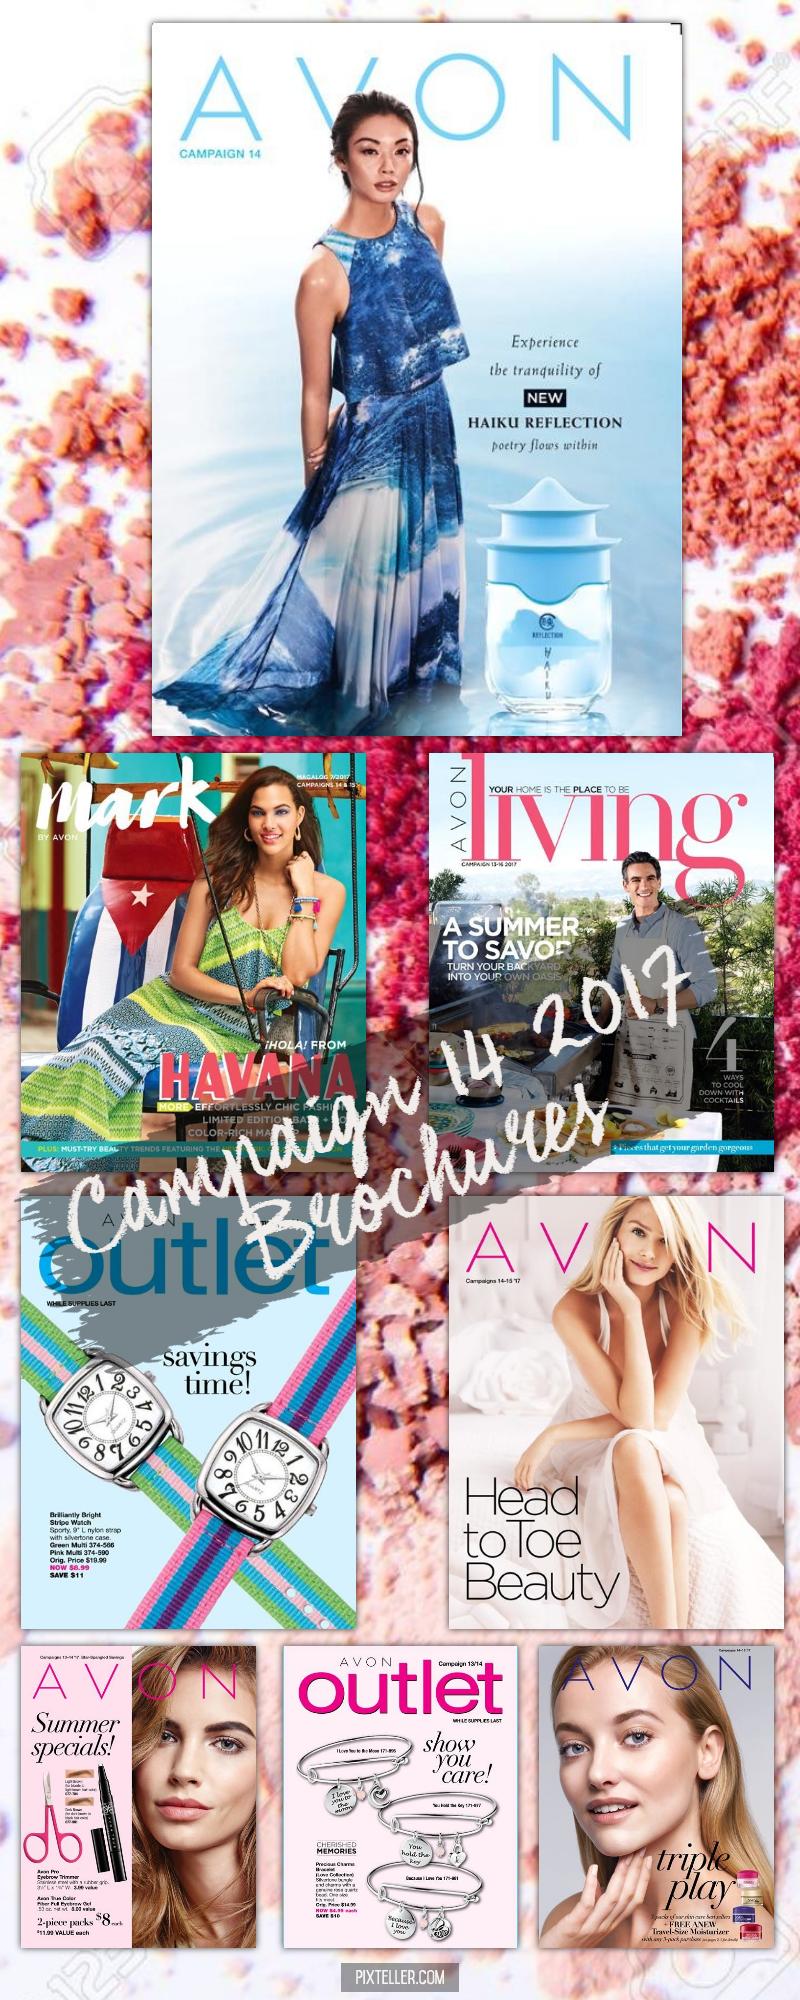 Magazine,                Art,                Advertising,                Brand,                White,                 Free Image